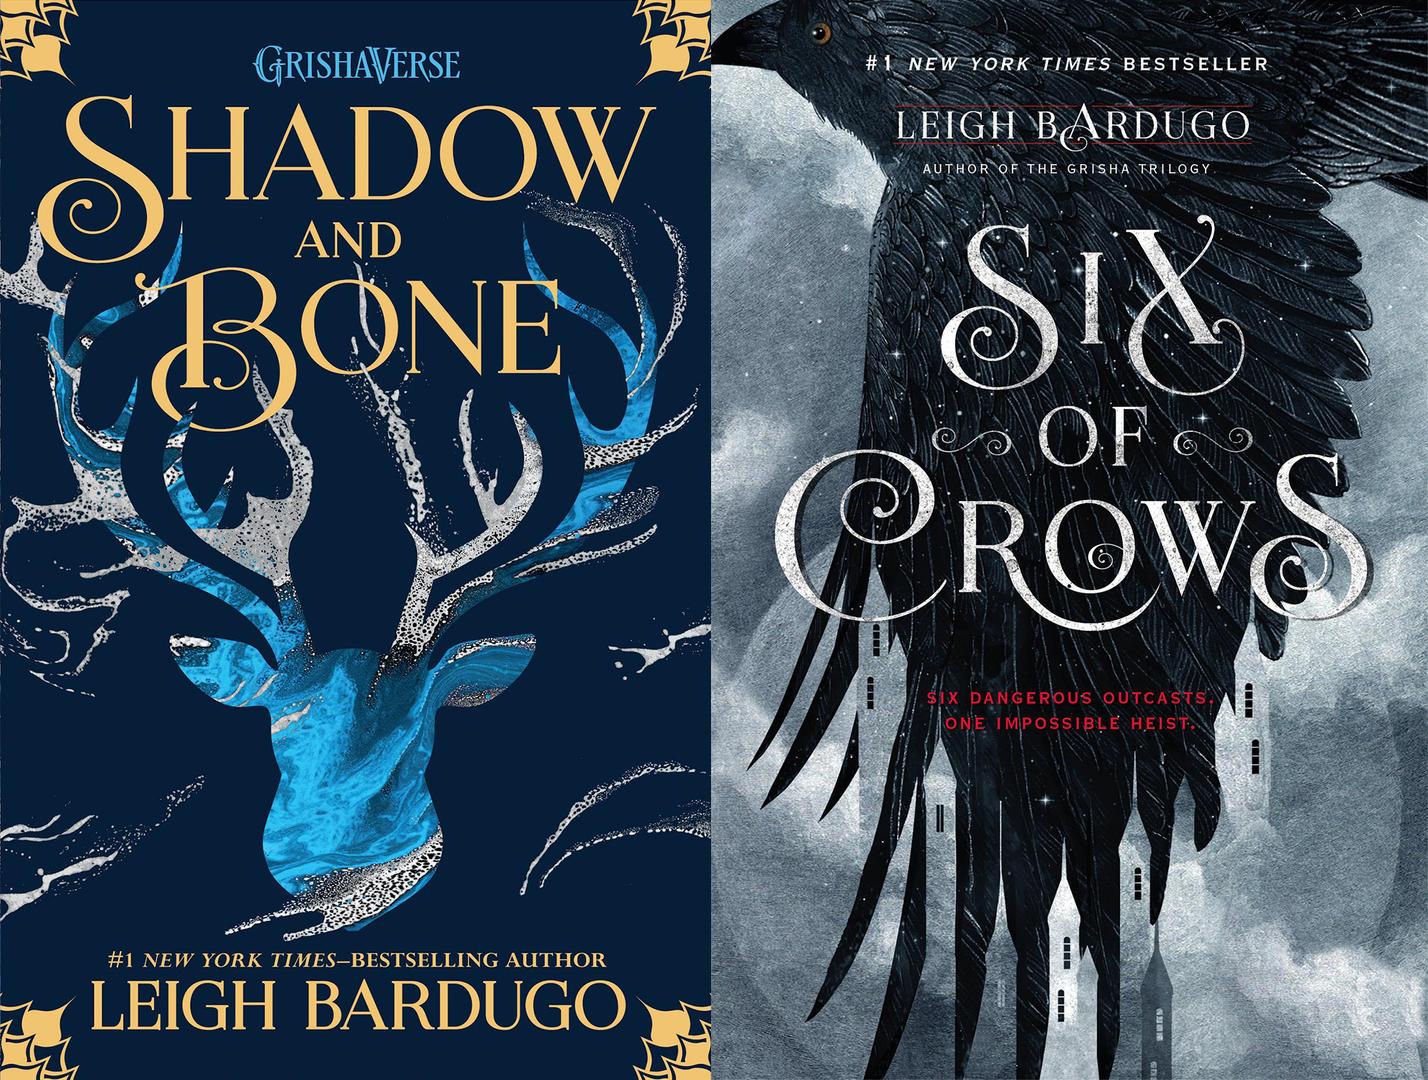 Netflix Announces Shadow and Bone Fantasy Series